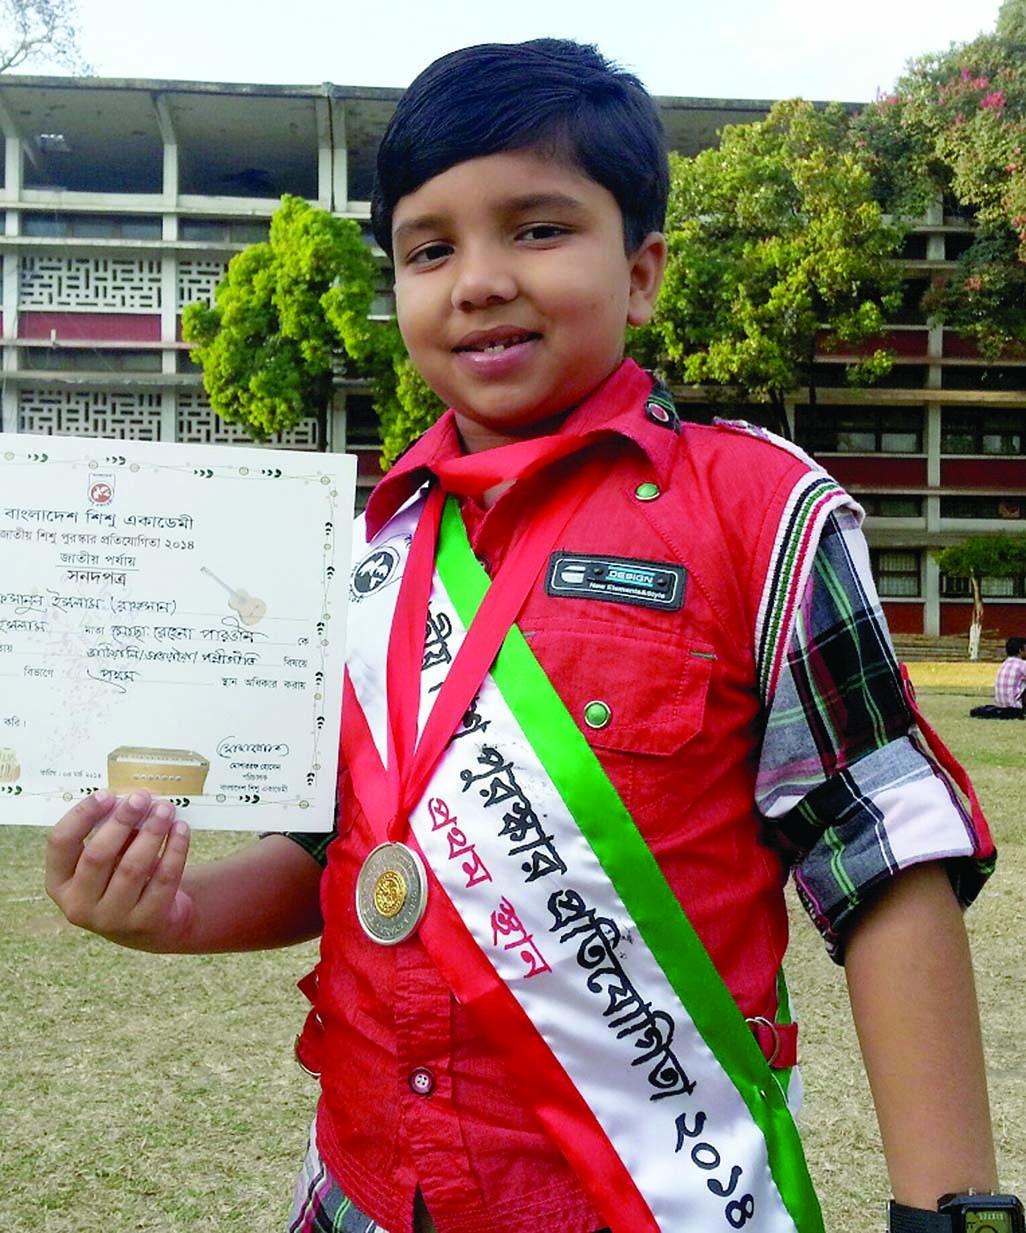 Nat'l Child Award 2014 Rafsan best in Bhatiali, Bhawaiya